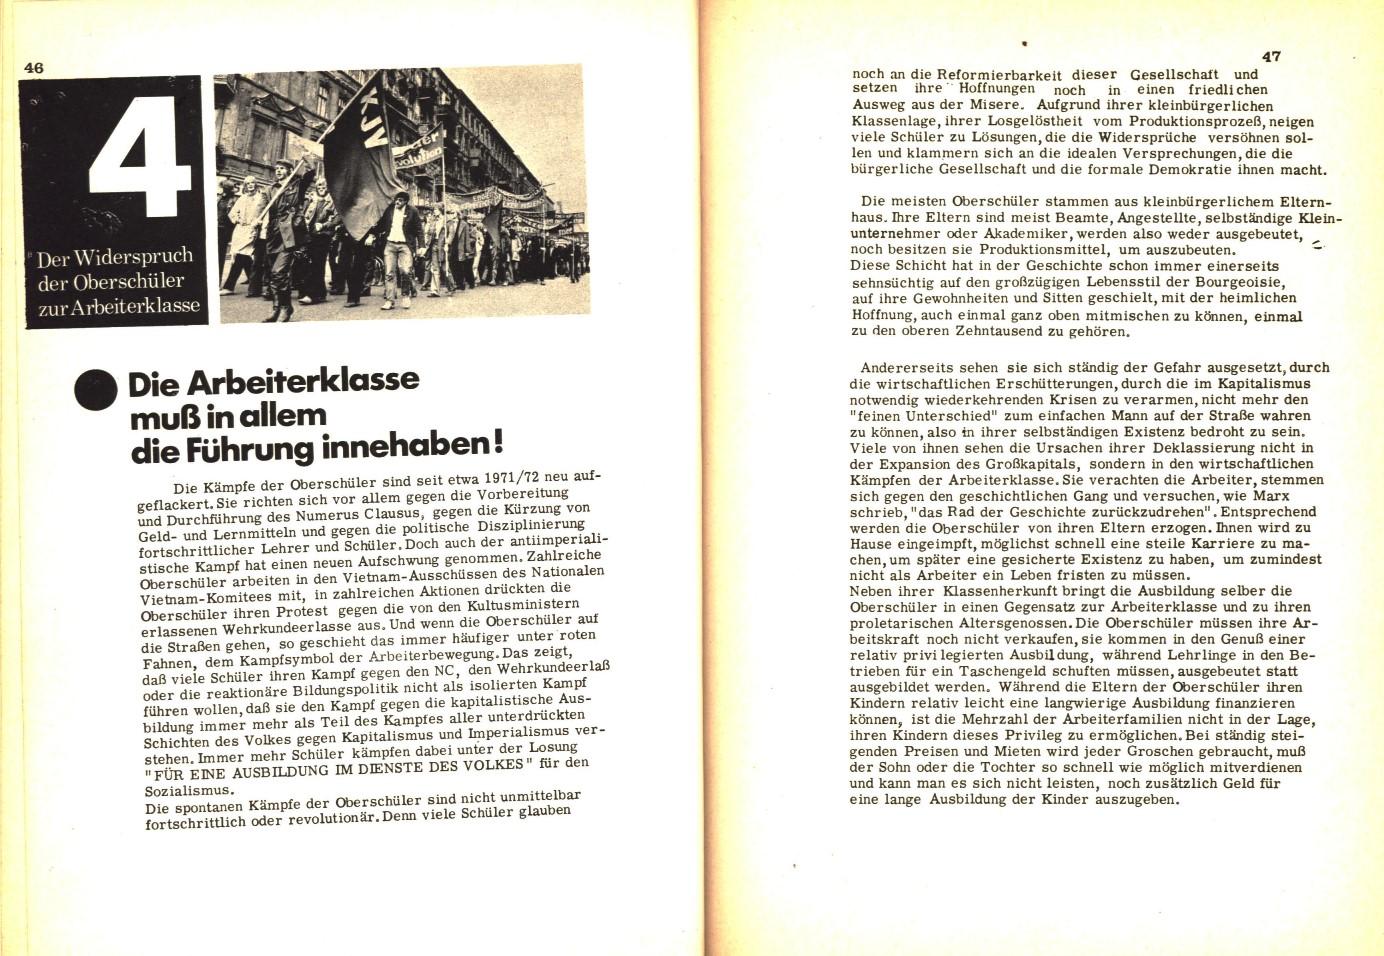 KOV_1973_Aktionsprogramm_26